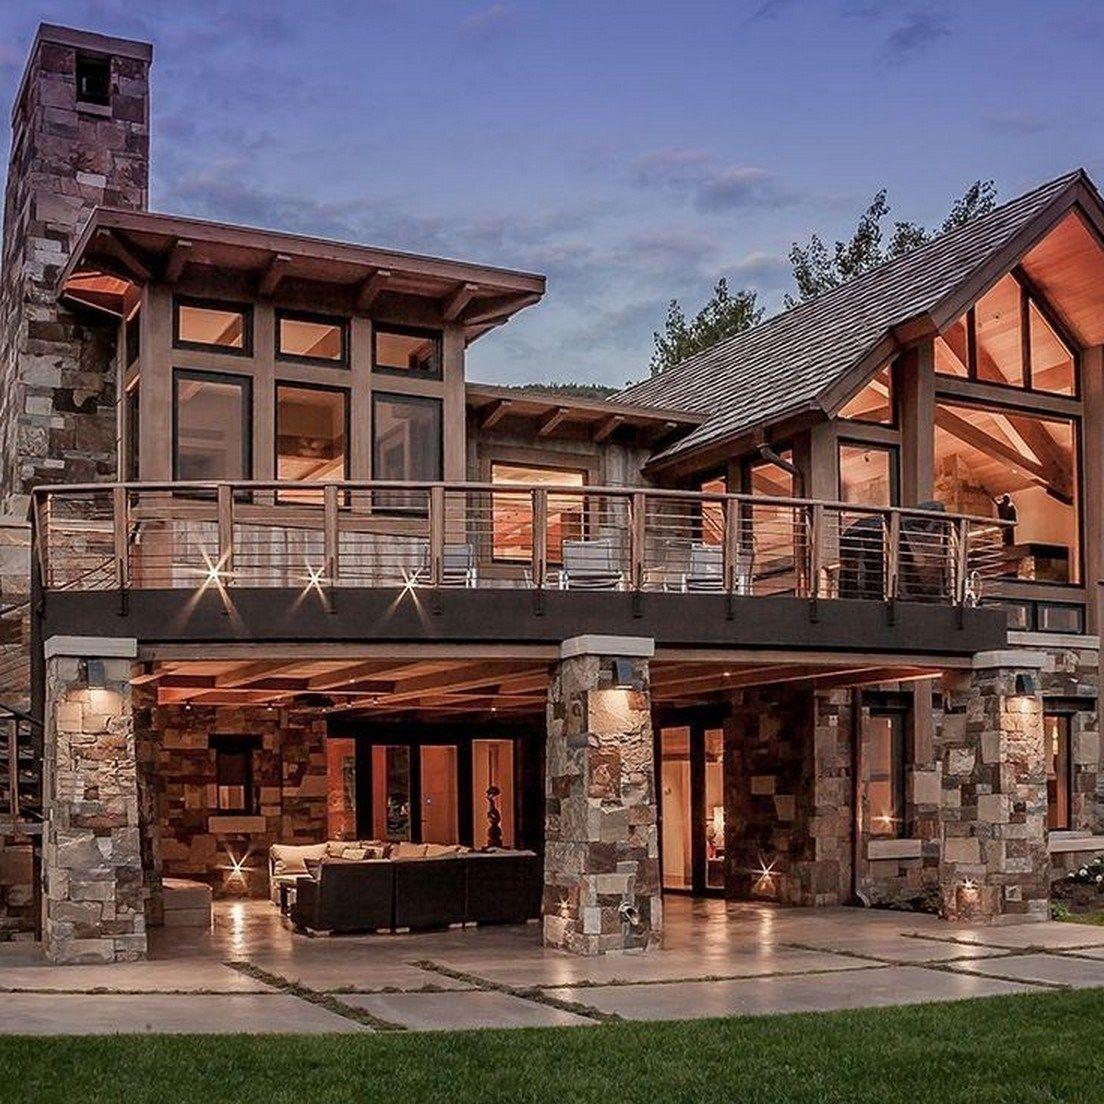 52 Most Popular Modern Dream House Exterior Design Ideas 49 Dream House Exterior Mountain Home Exterior House Designs Exterior